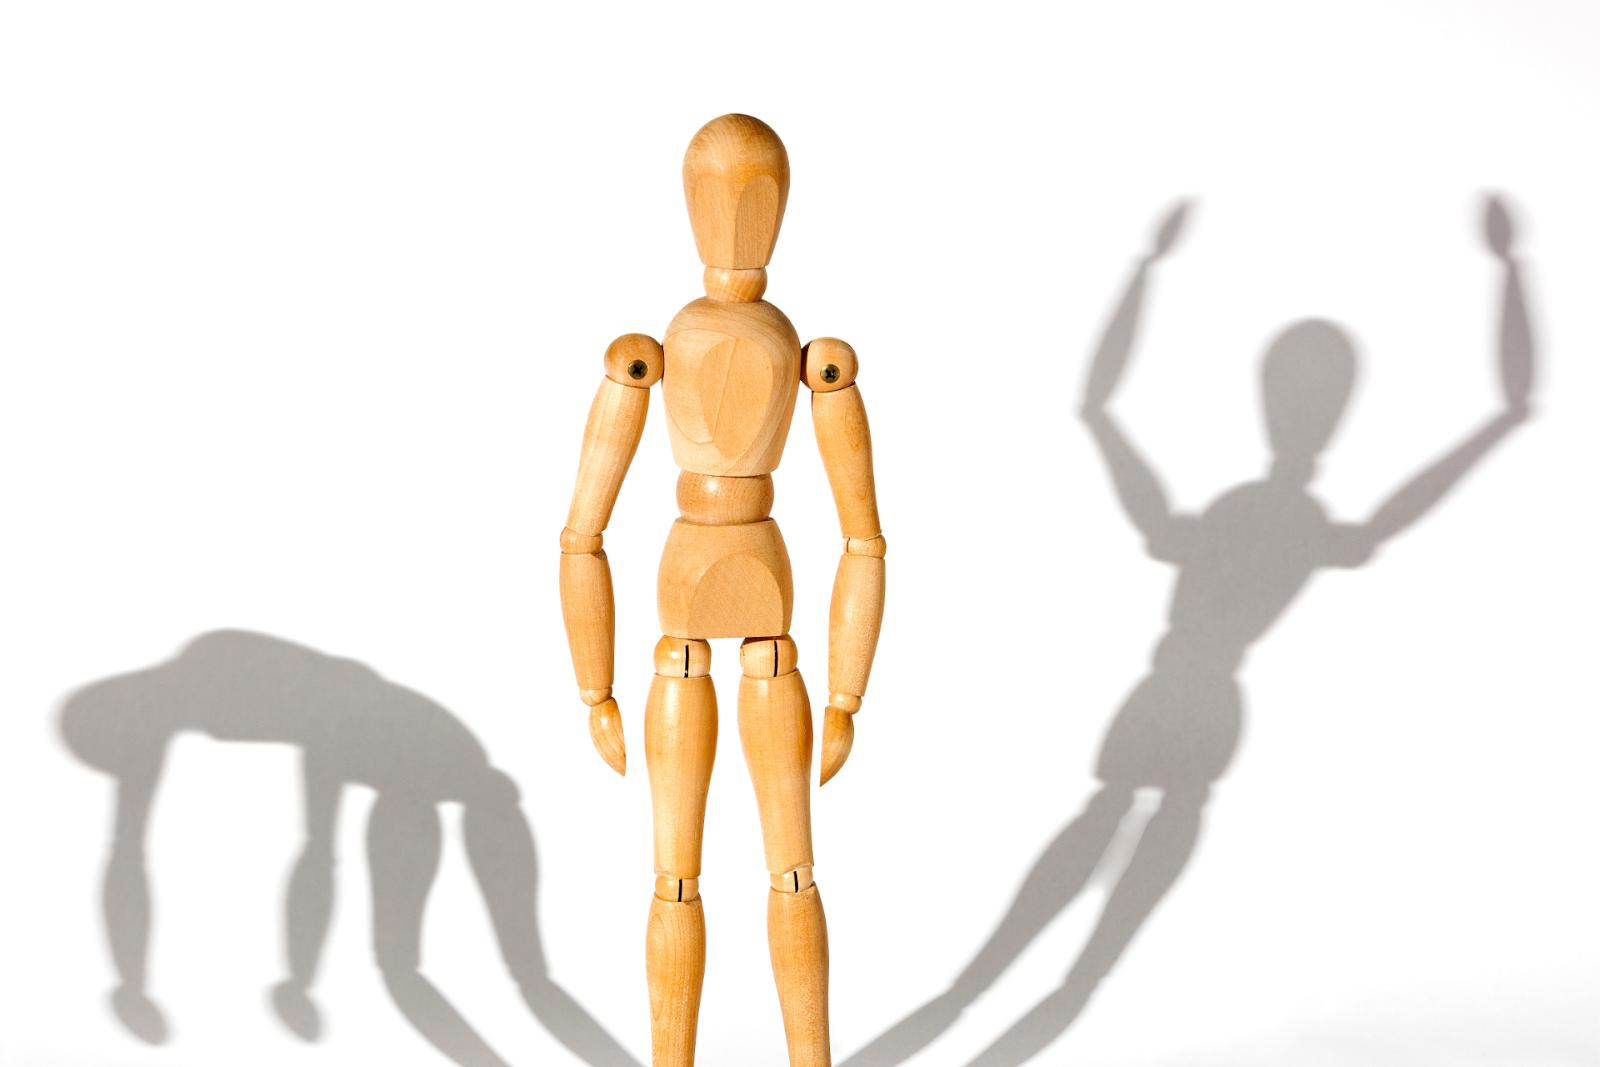 model figurine symbolizing symptoms of bipolar disorder